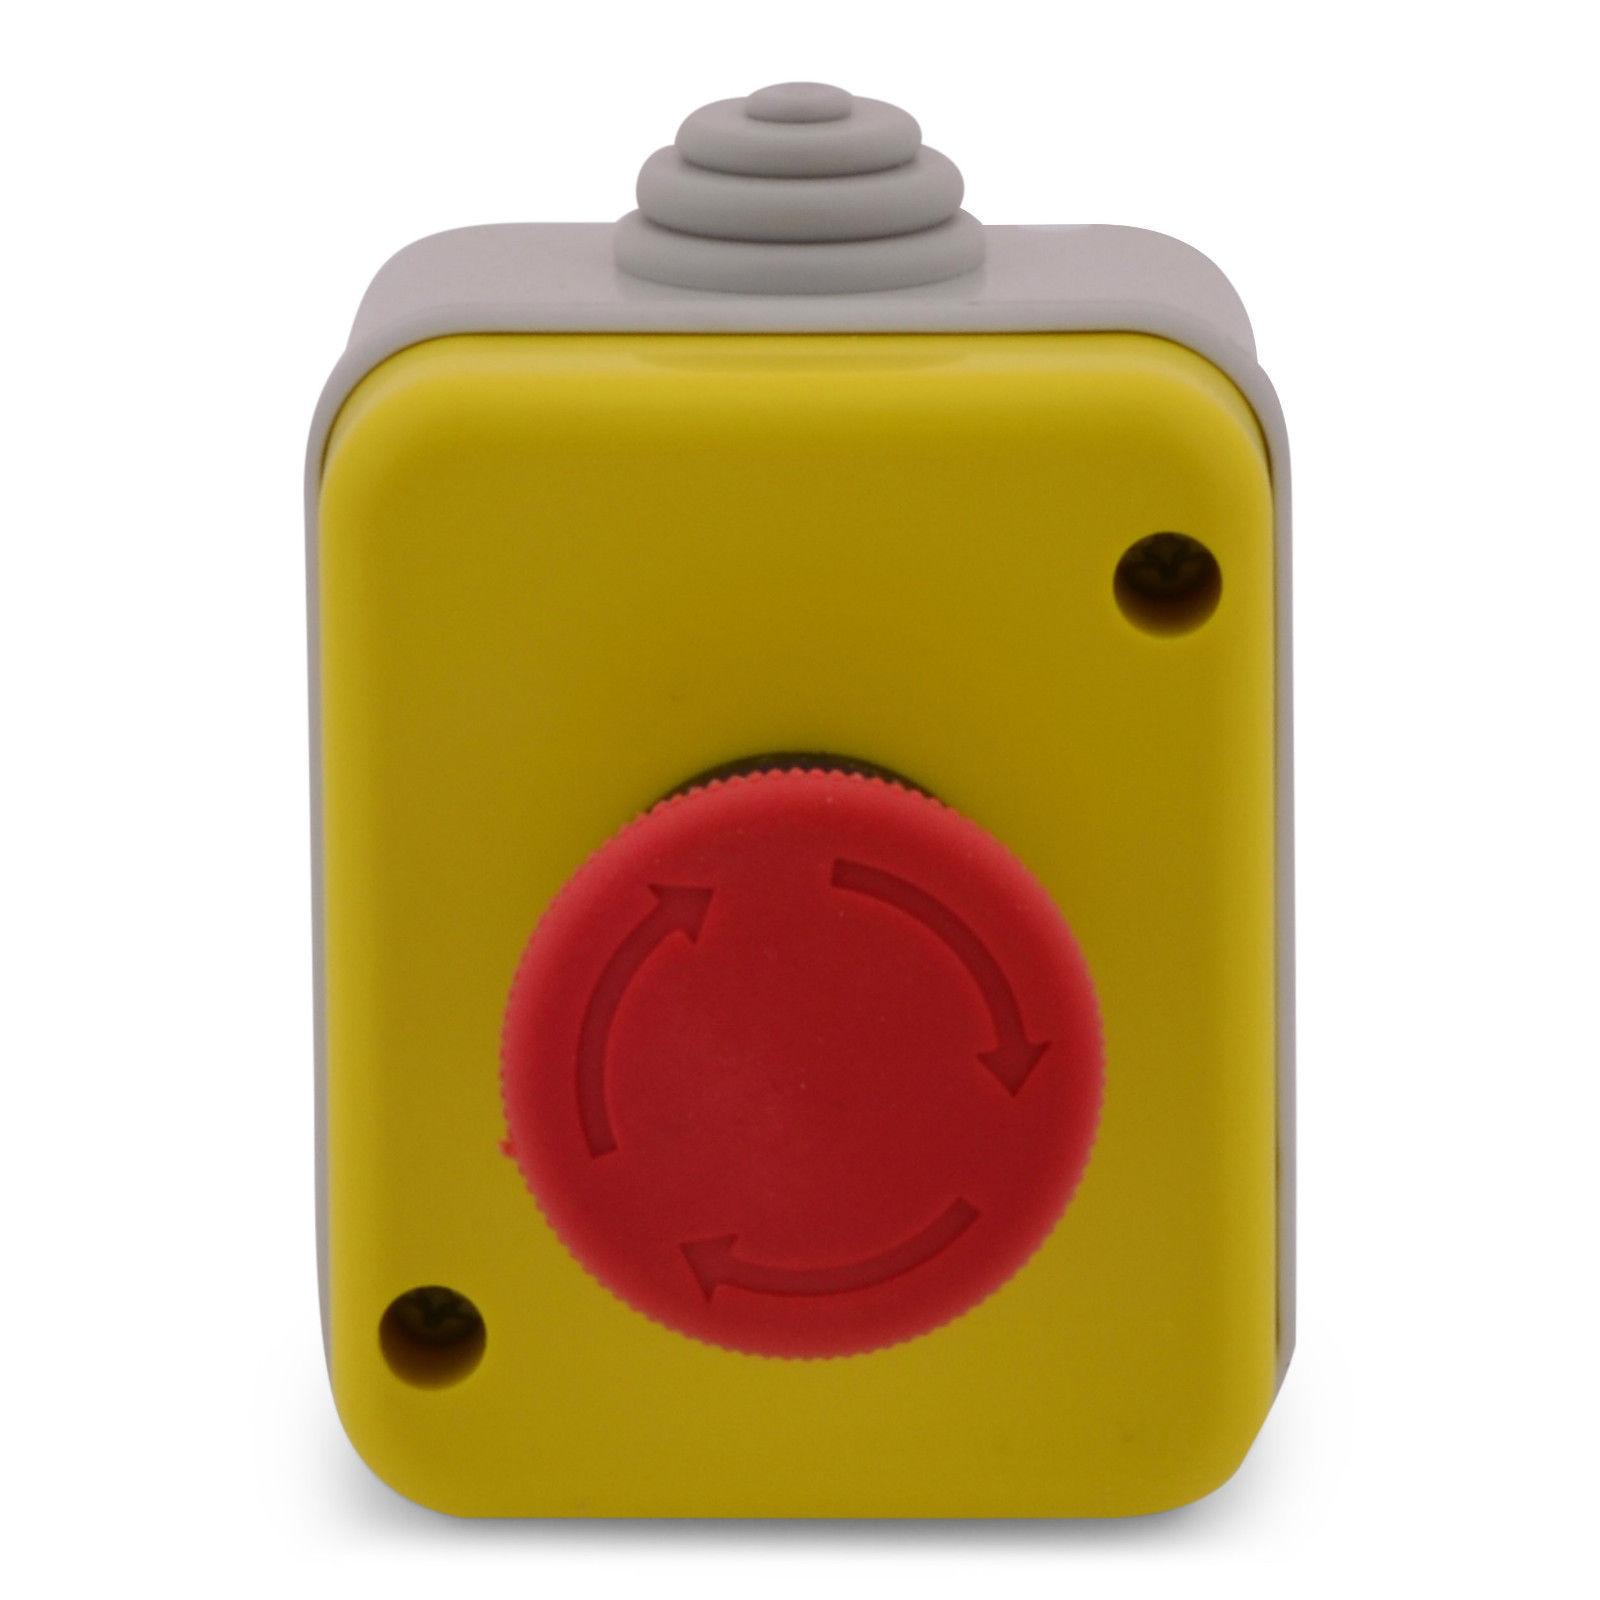 Red Sign Pilz Emergency Push Taste Schalter Station 1 NC Normally Closed BAF